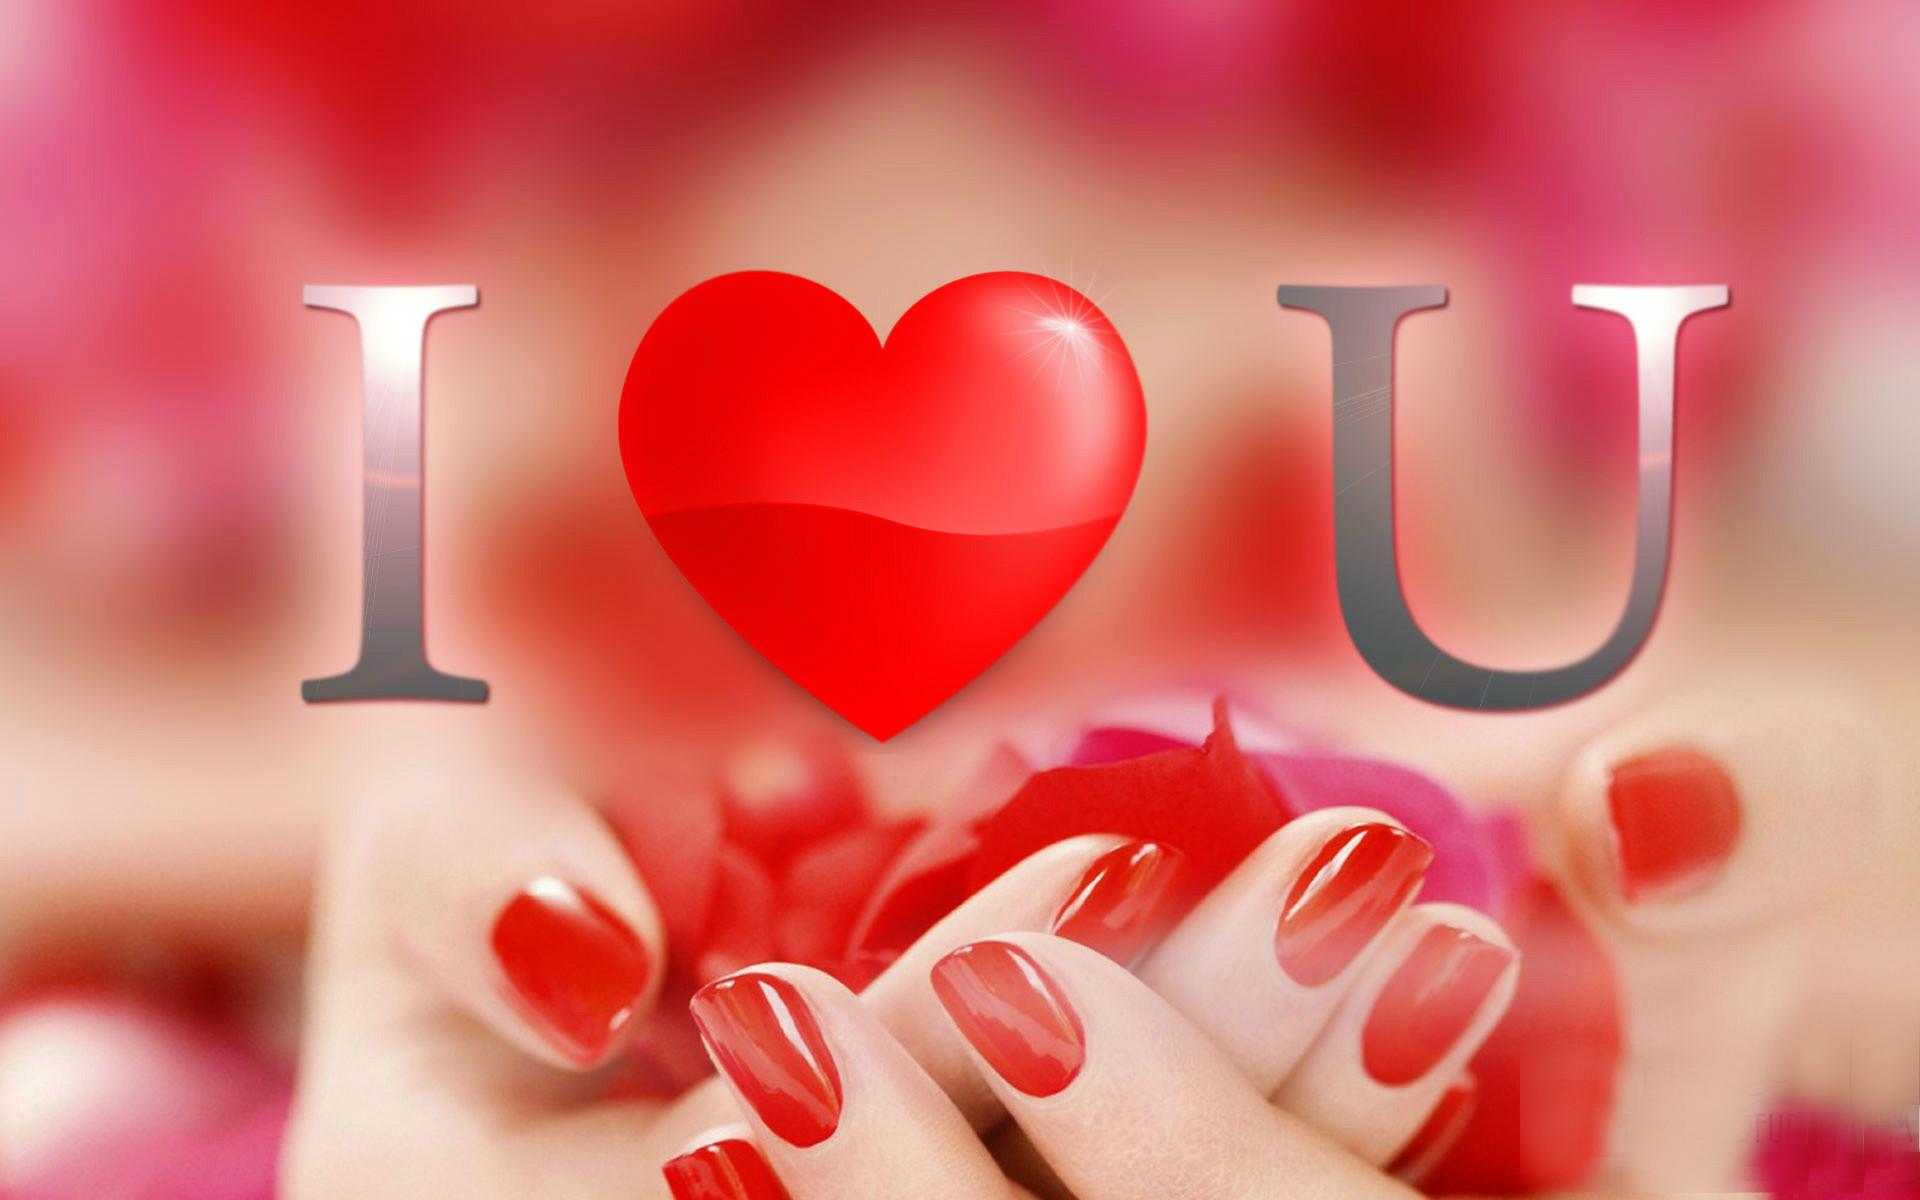 Data-src - Cute Love Heart Wallpapers For Mobile - HD Wallpaper